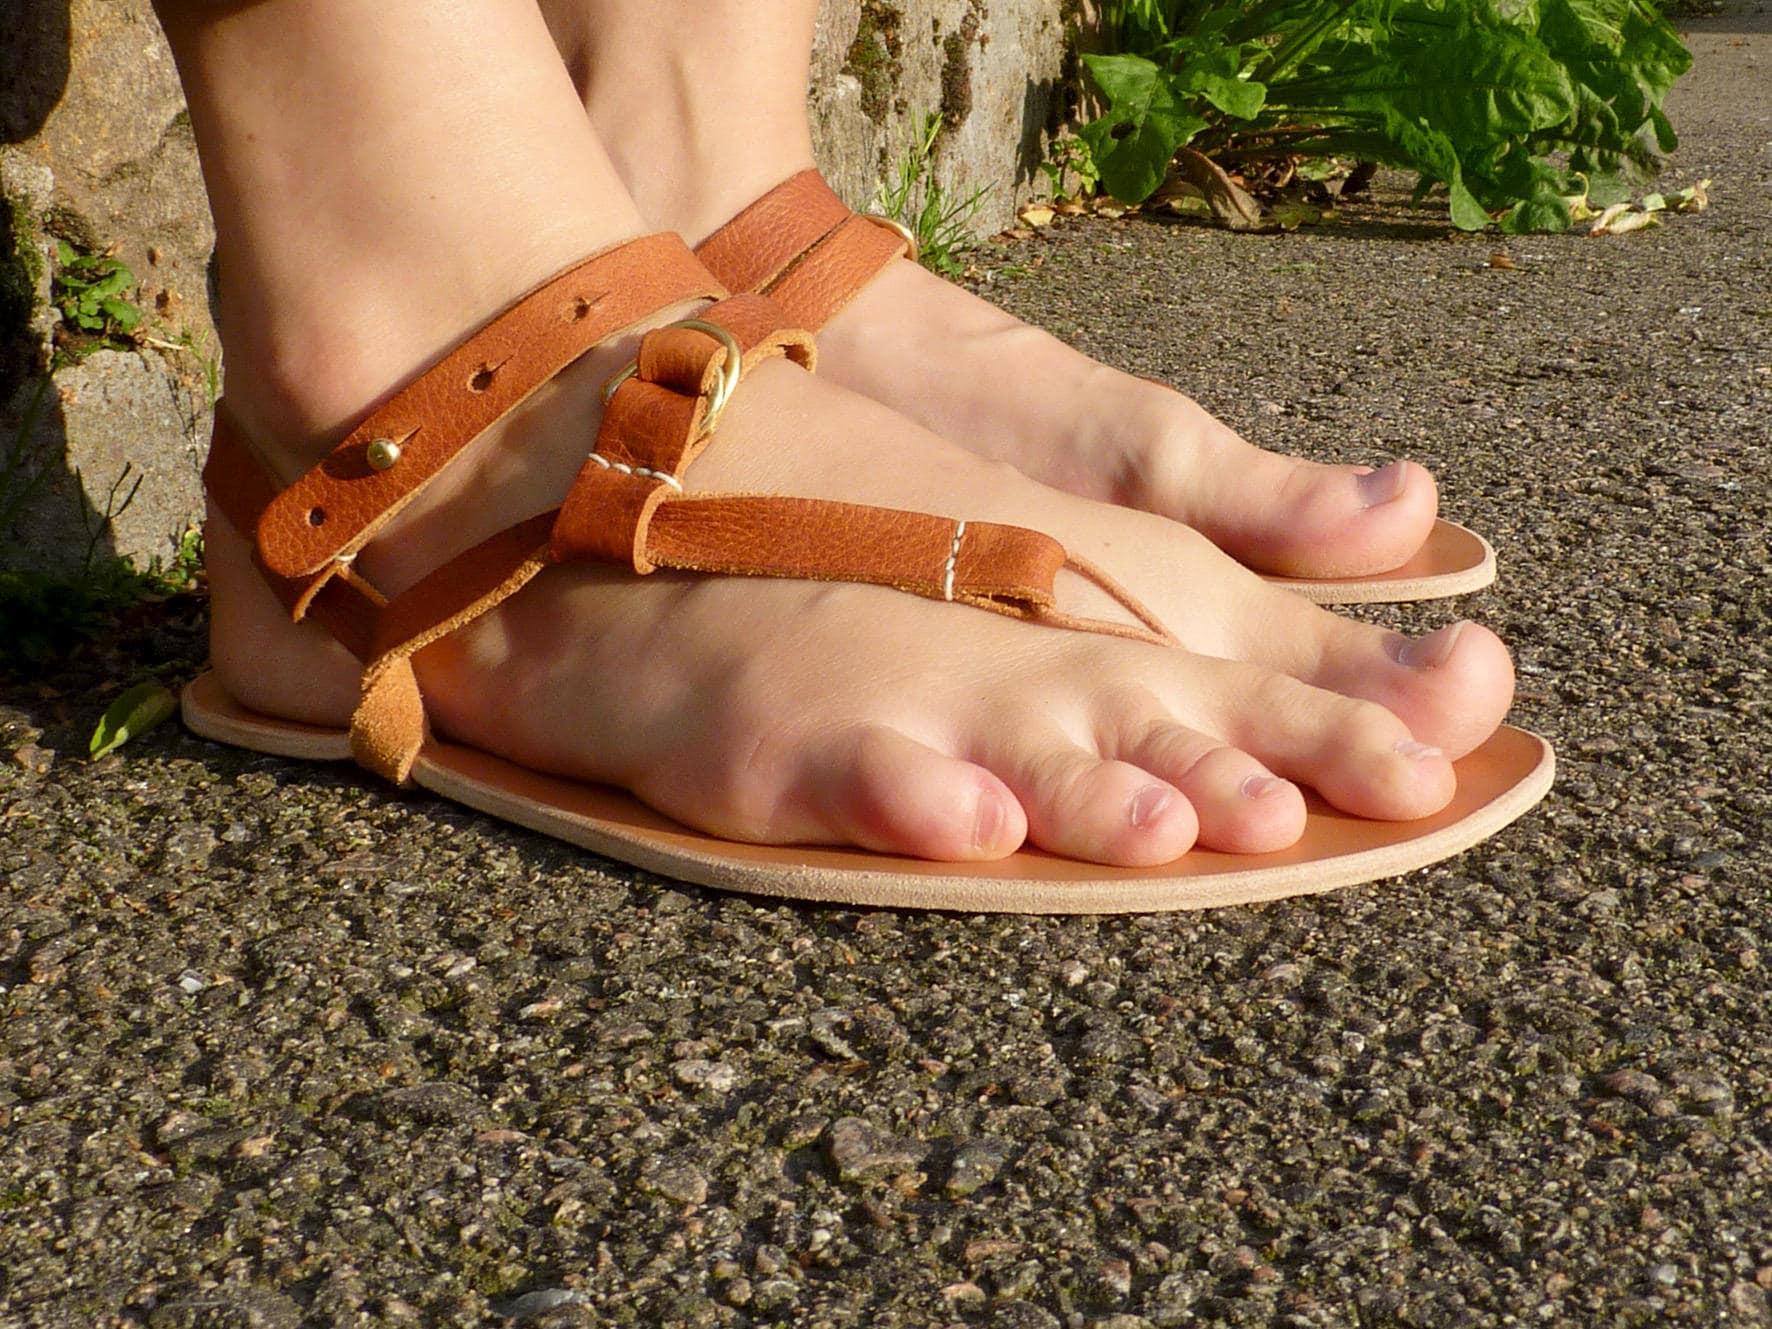 cc9b3473f920f Waku Waku - Brown leather laces - Minimalist sandals / Barefoot feel /  Earthing / Handmade / Vegetable tanned leather